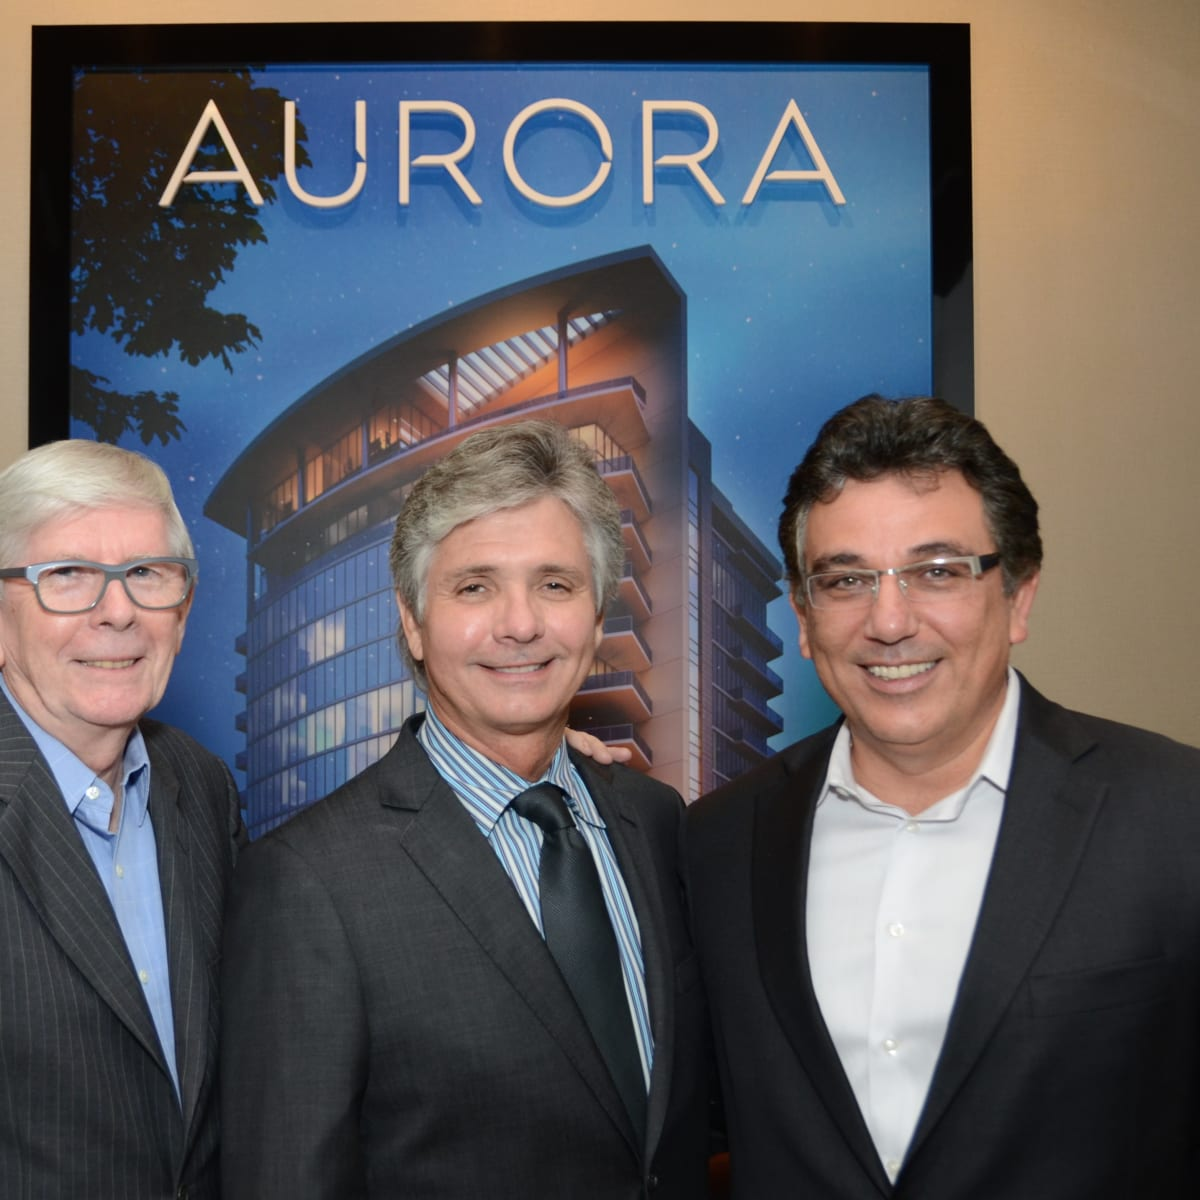 News, Shelby, Aurora, September 2015, Alan Ritchie, Chris Sims, Marko Disigenis